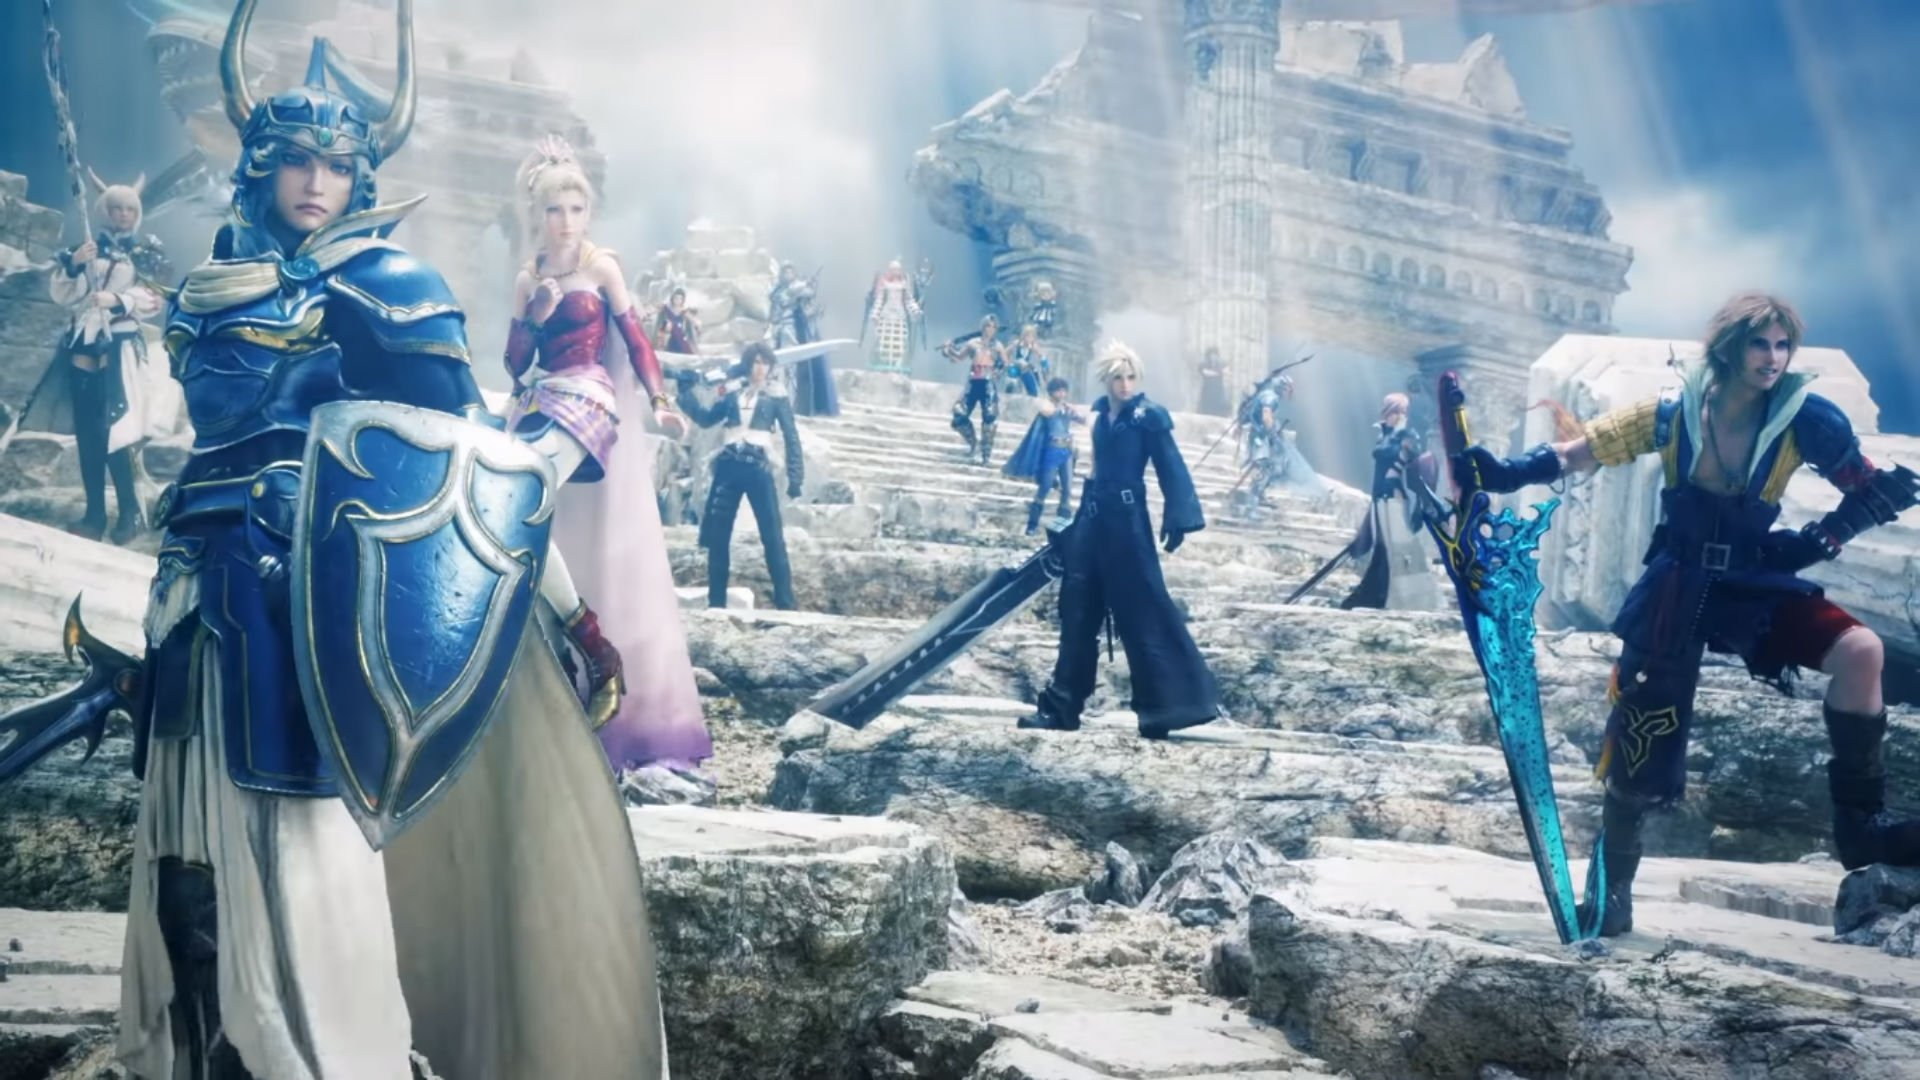 Check out Dissidia Final Fantasy NT's opening cutscene screenshot